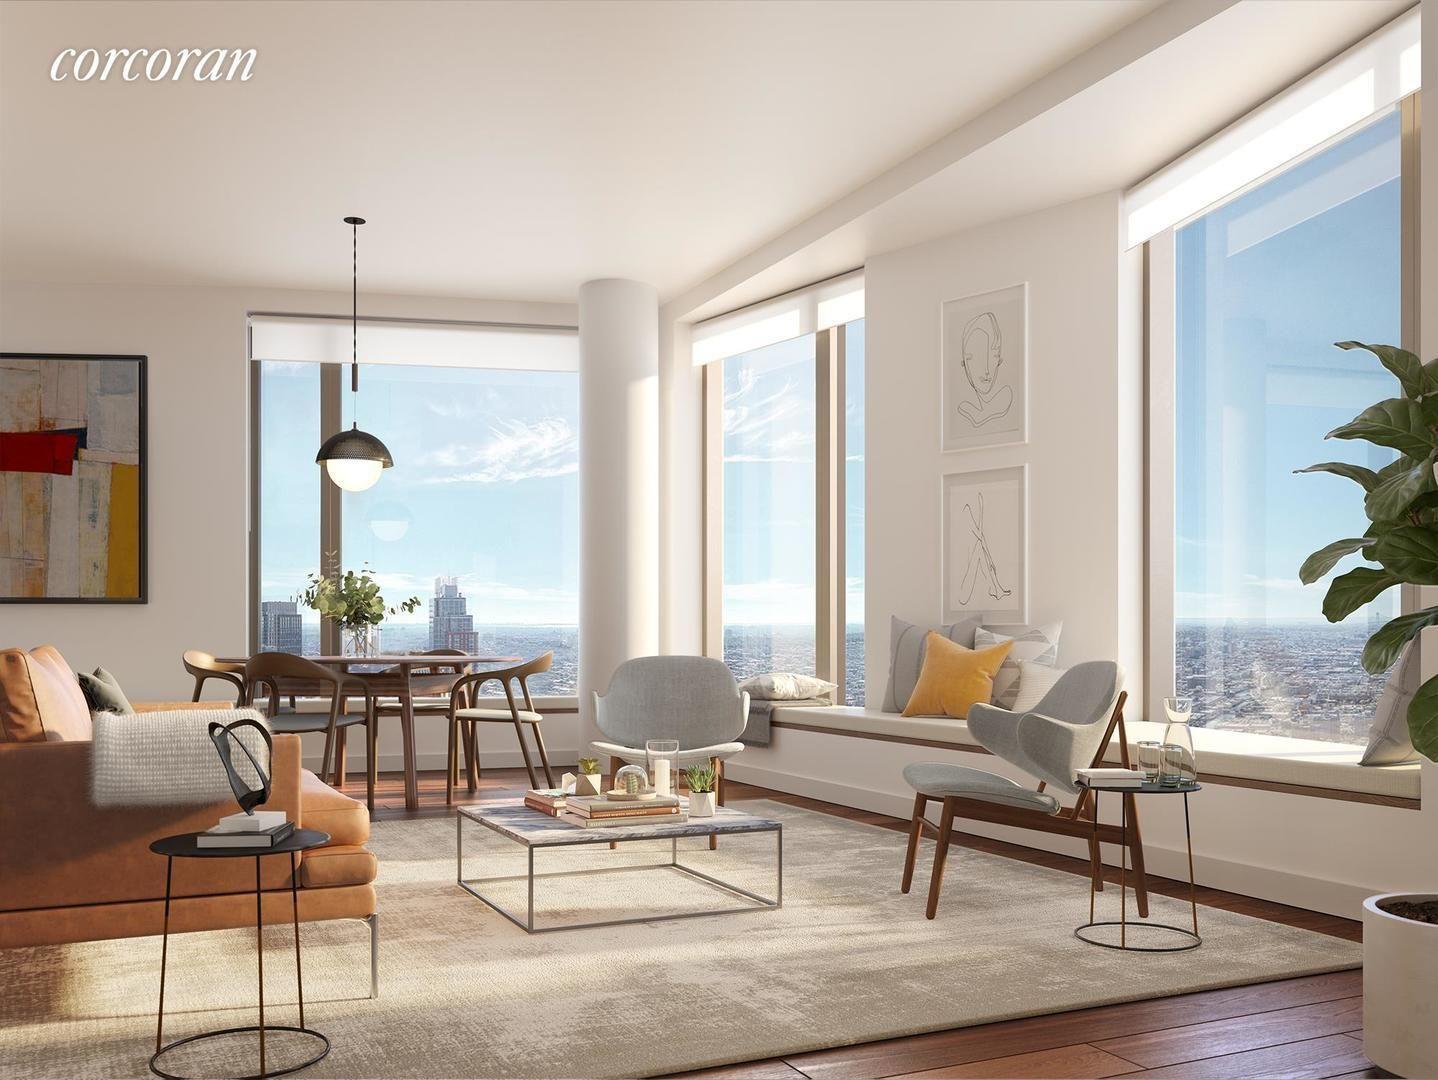 Apartment for sale at 11 Hoyt Street, Apt 27K